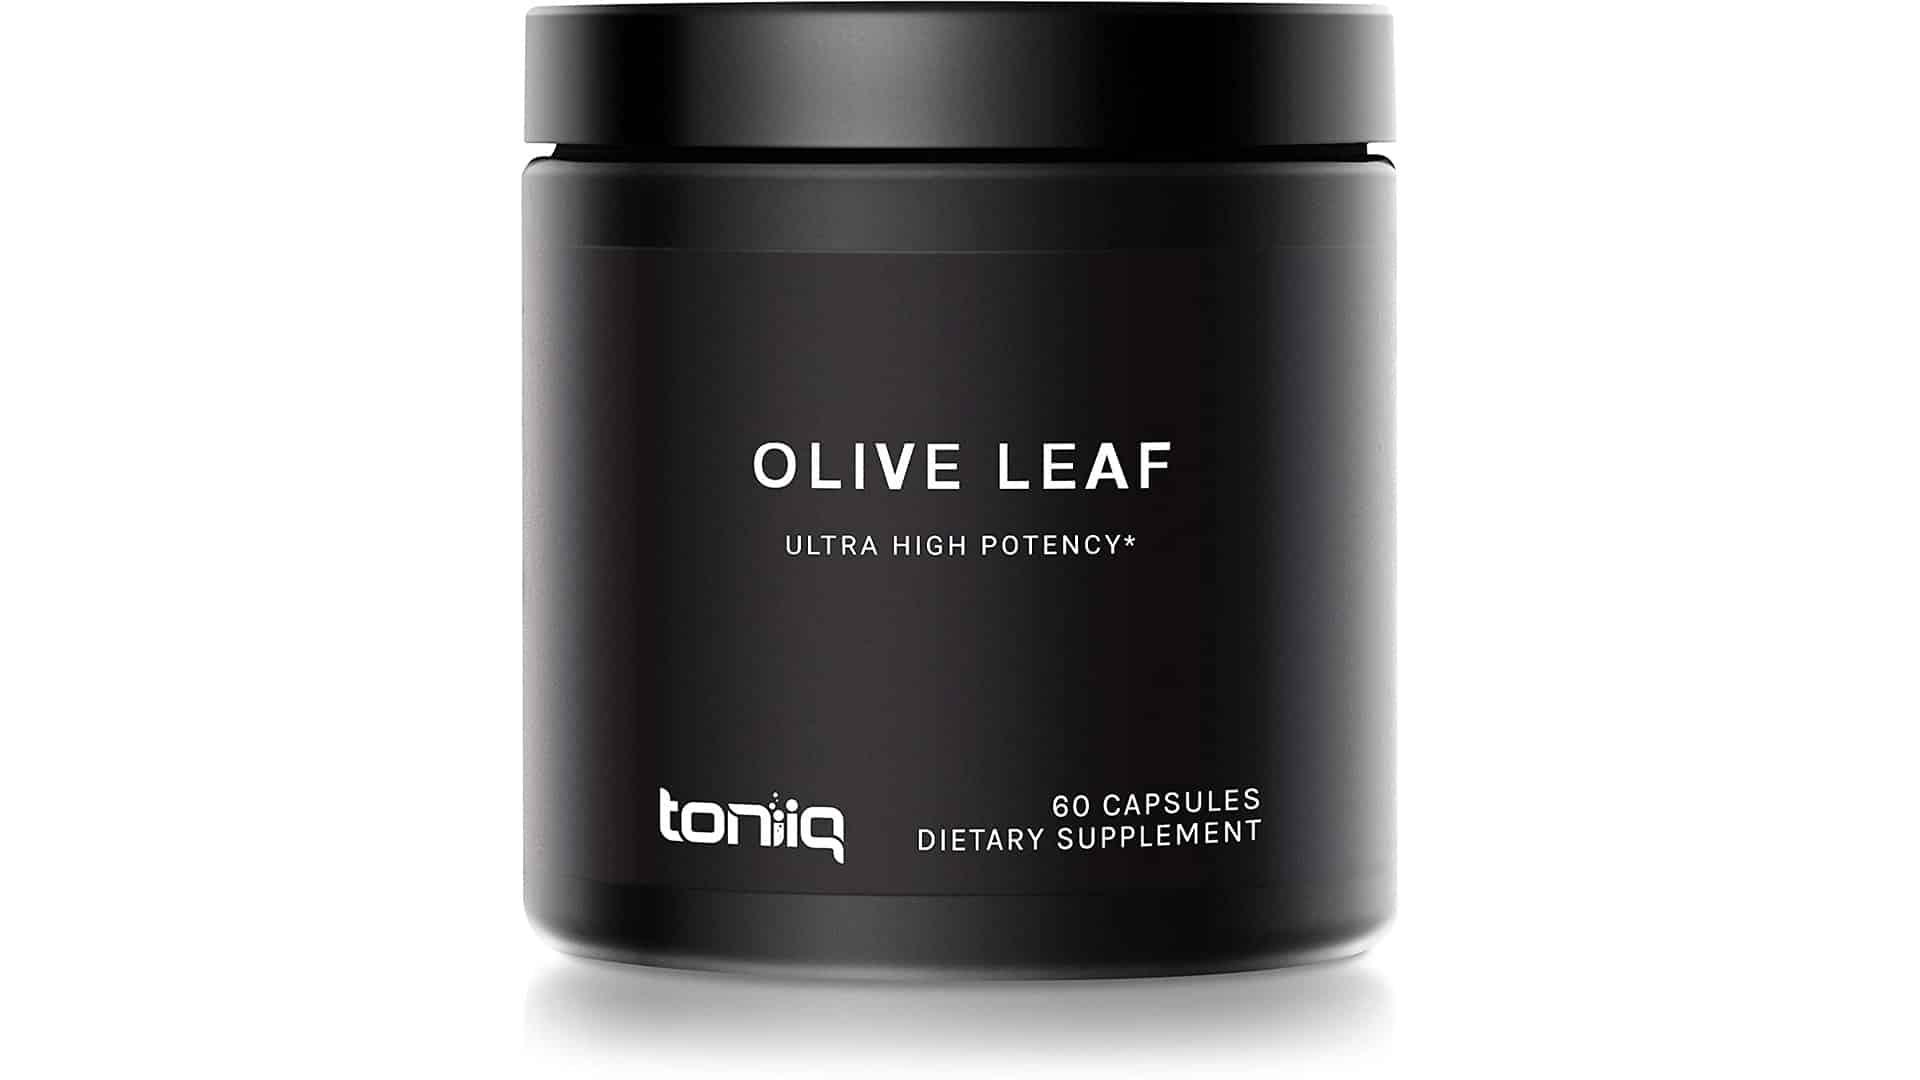 Toniiq – Olive Leaf Ultra High Potency